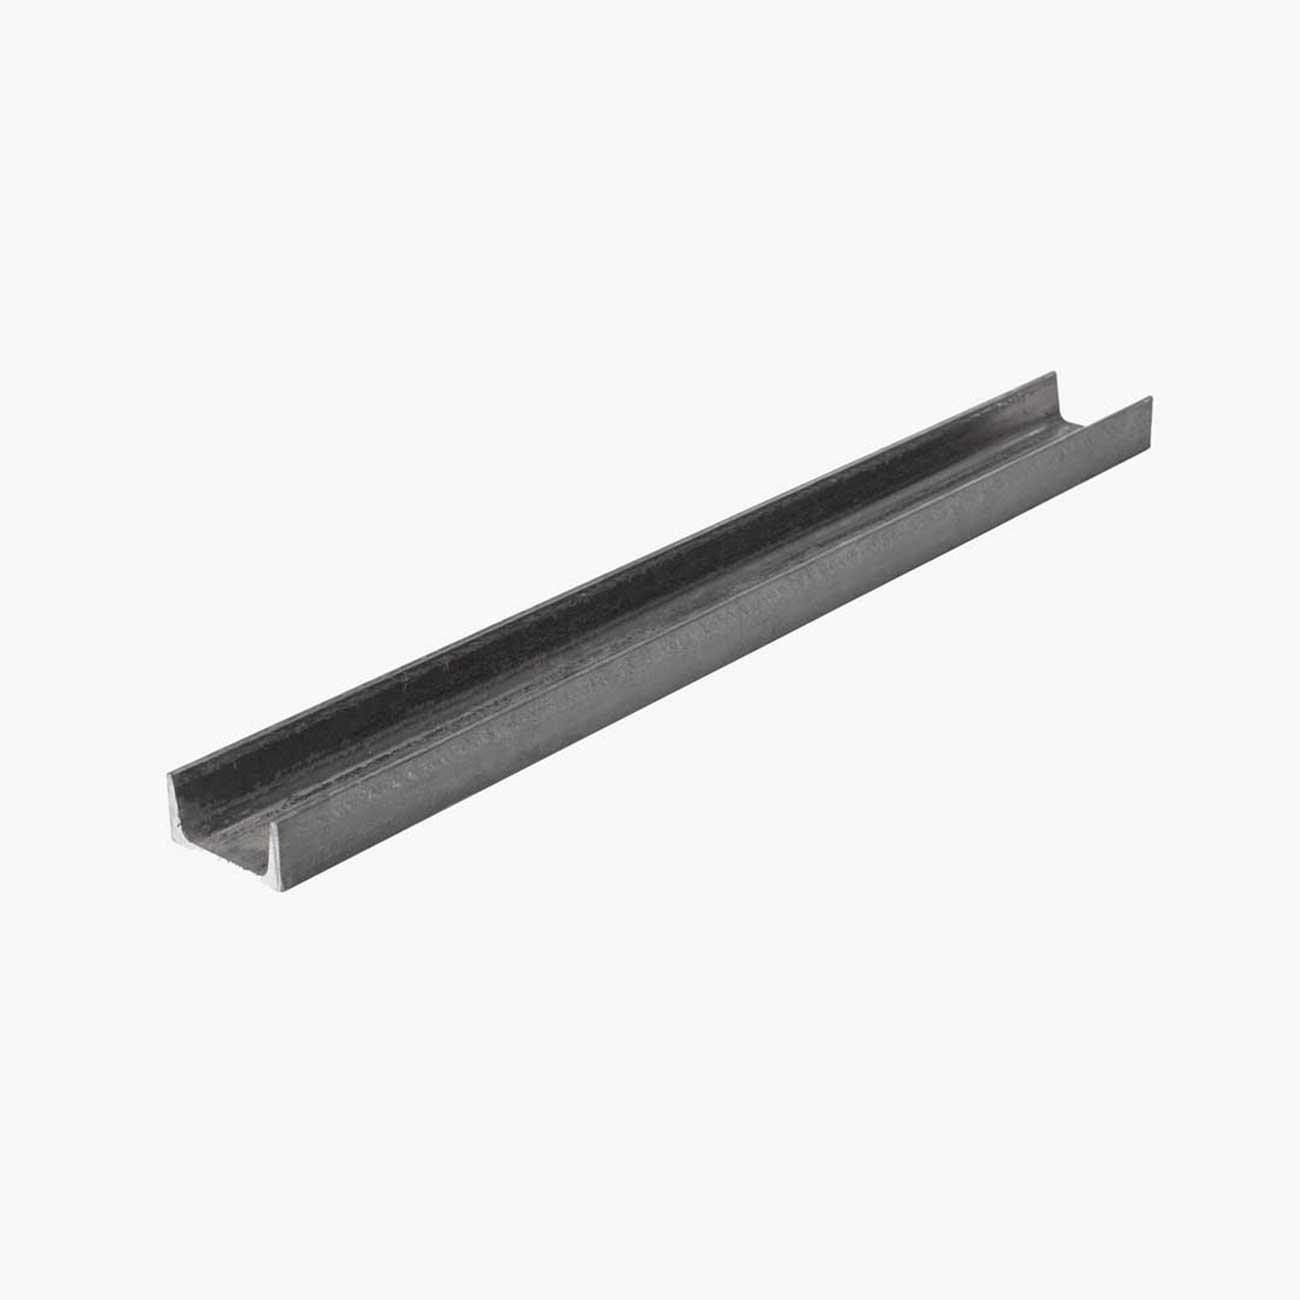 C-Channel Steel Bar A36